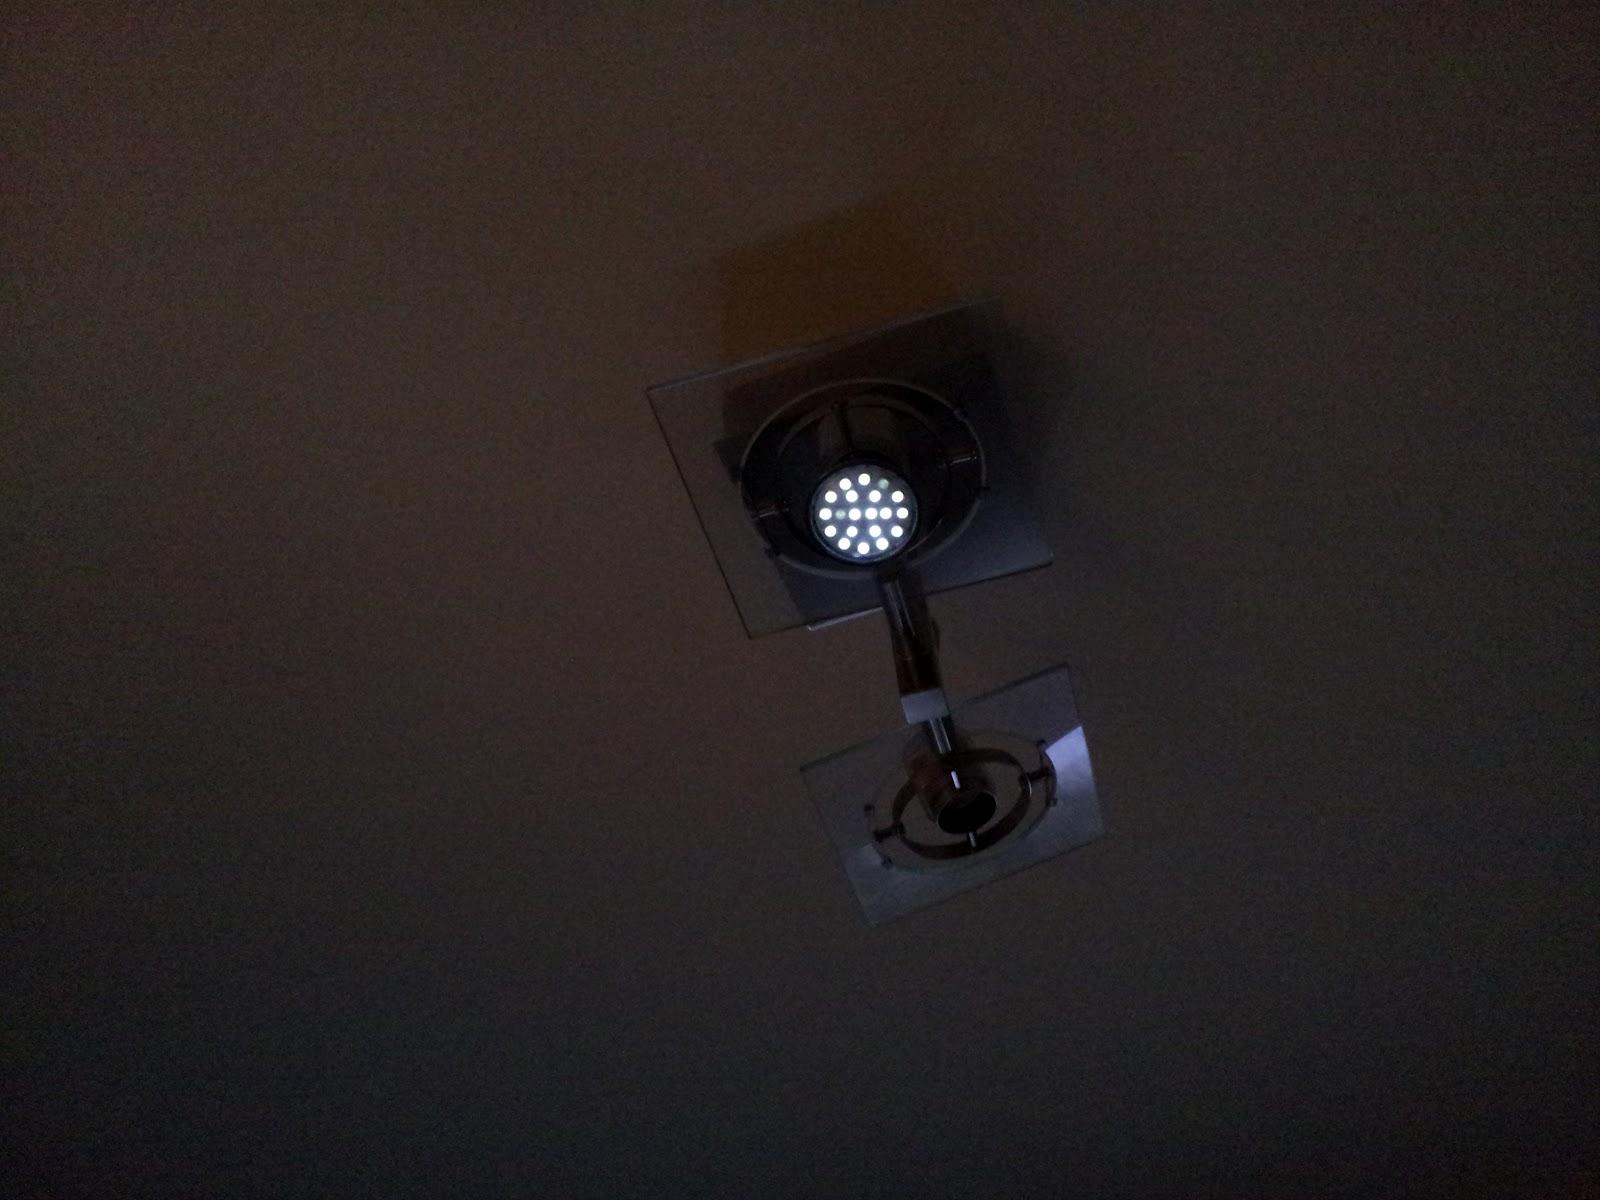 Iluminaci n led bombillas led quedan medio encendidas - Lamparas que den mucha luz ...